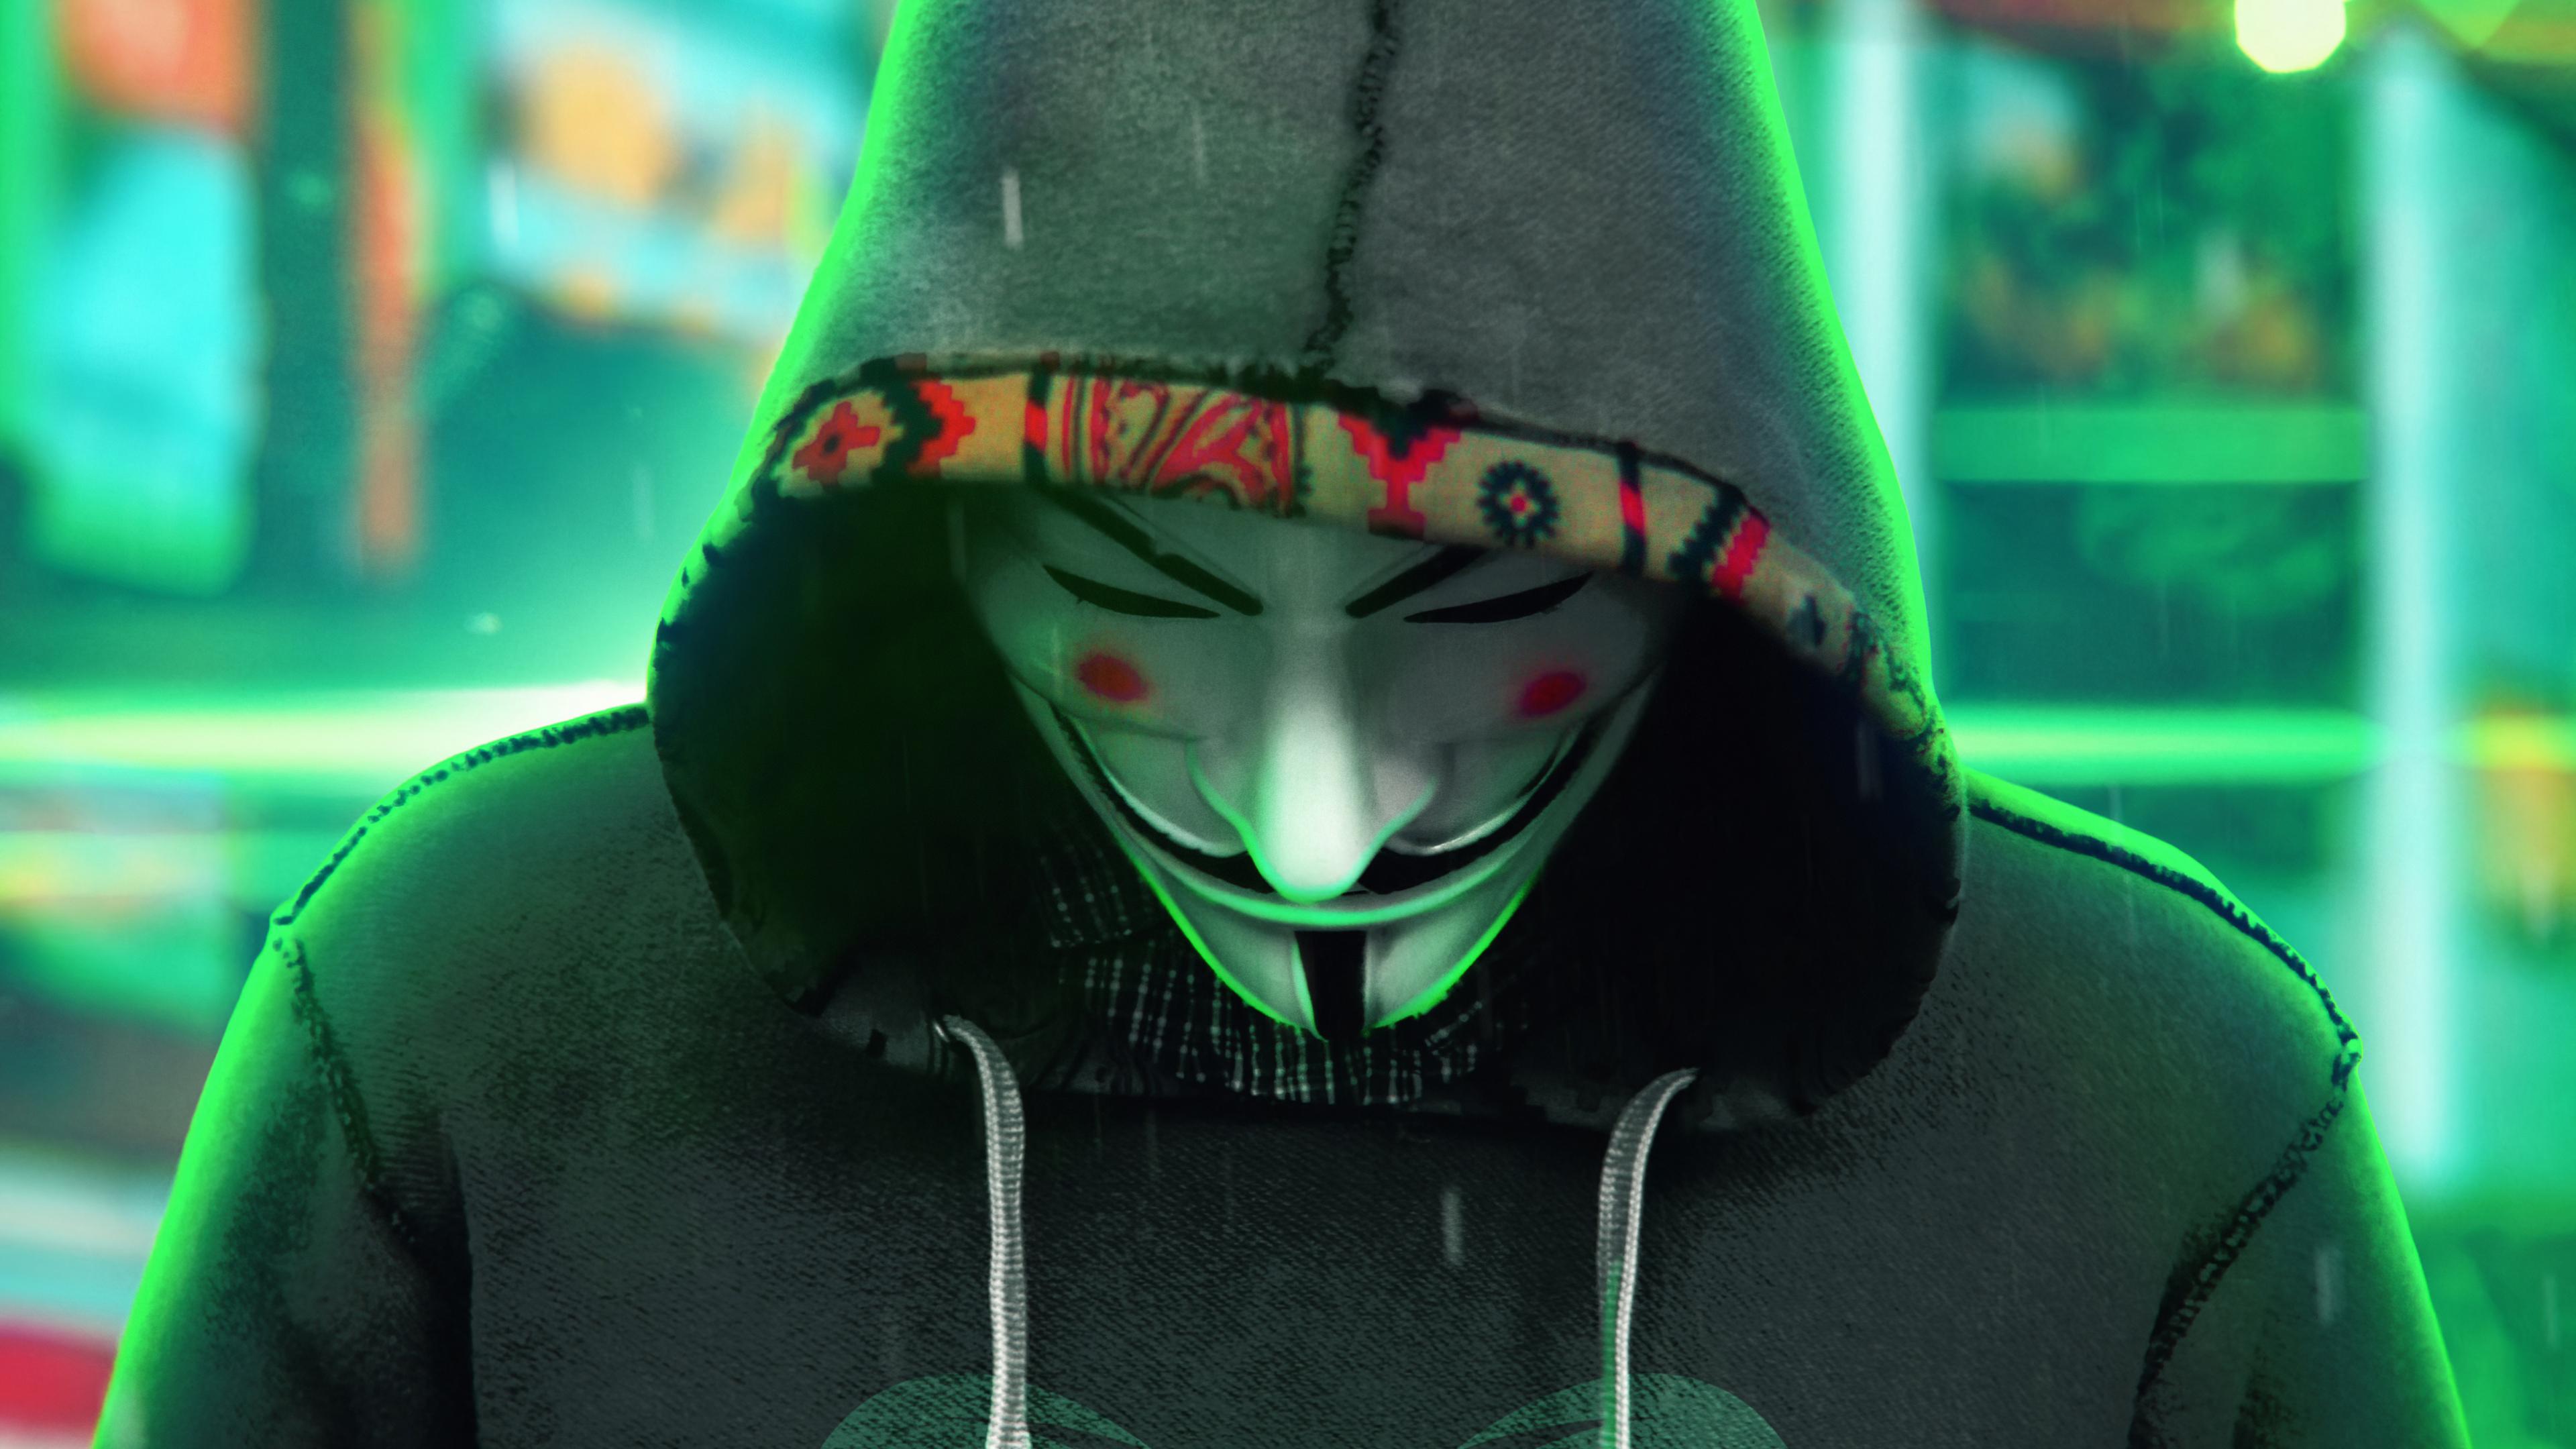 anonymus man face down 1580055601 - Anonymus Man Face Down -